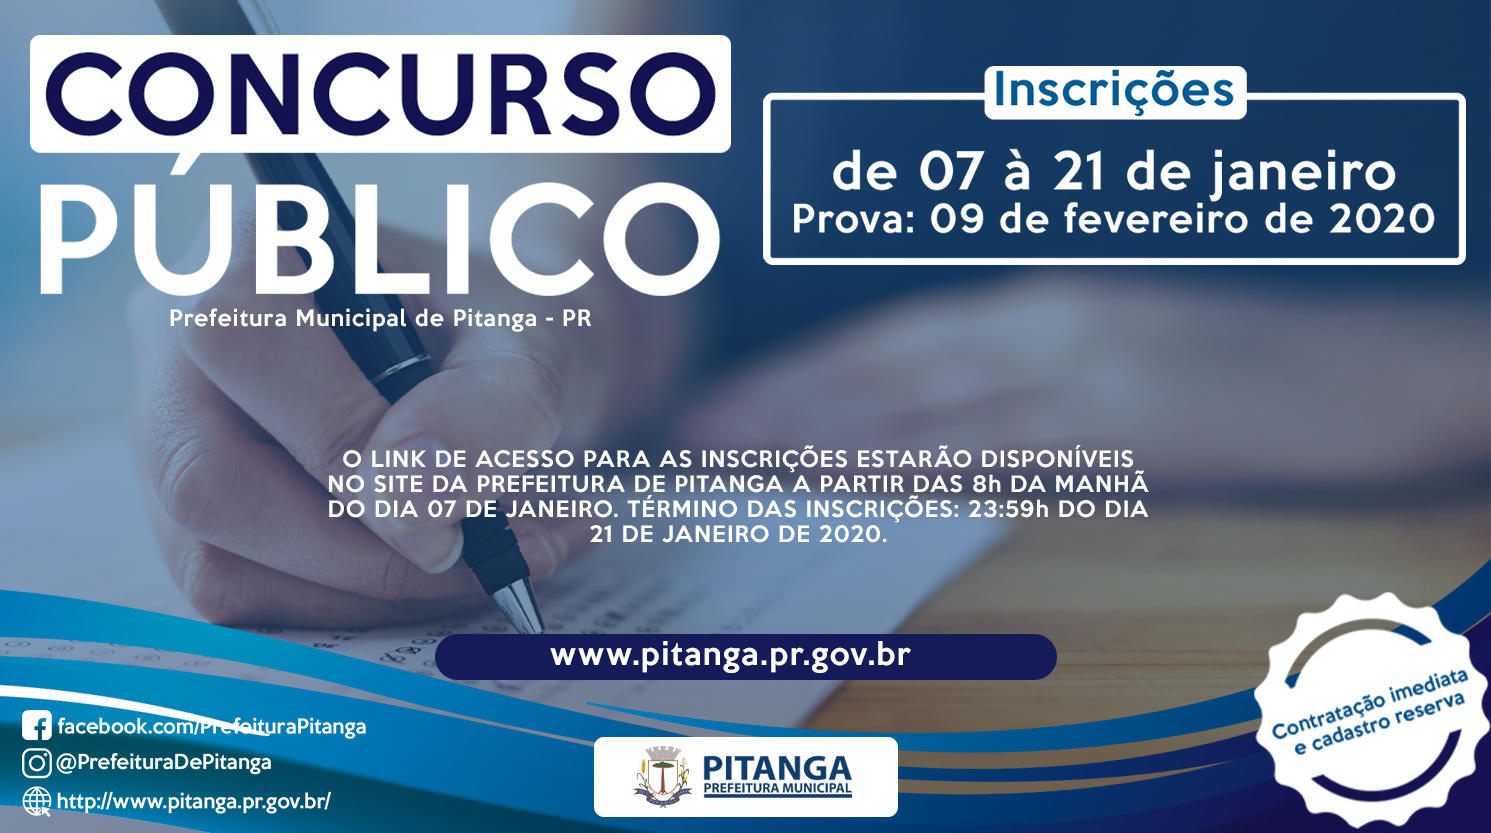 Concurso Pitanga